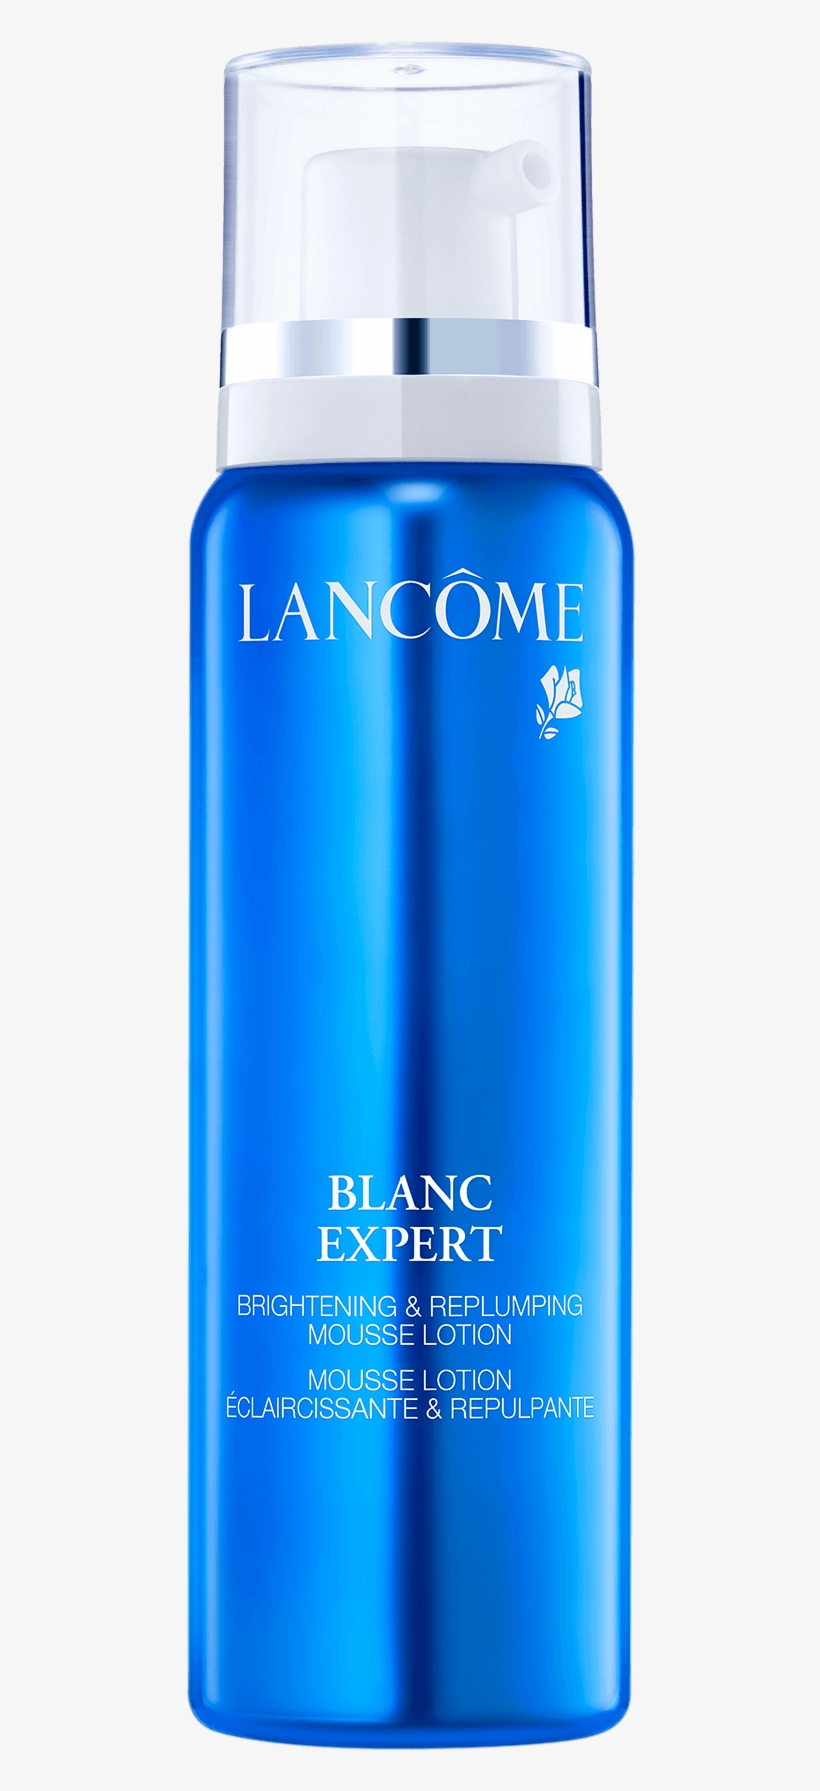 Lancome Blanc Expert Mousse Lotion Rm240-pamper - Lancome Blanc Expert Mousse Lotion, transparent png #9020471